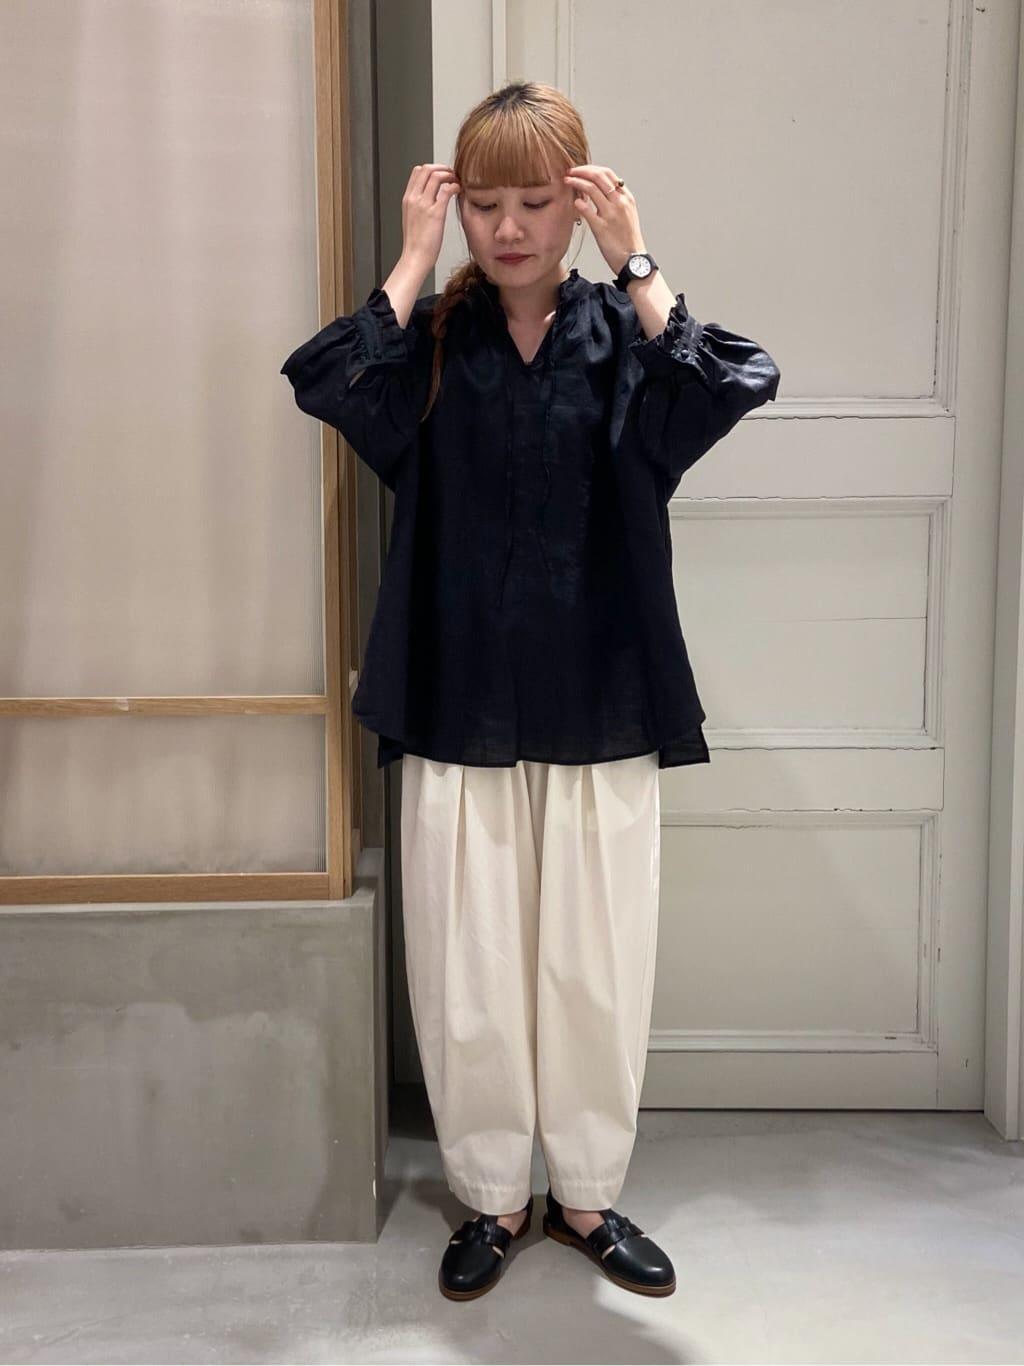 bulle de savon 渋谷スクランブルスクエア 身長:160cm 2021.08.14